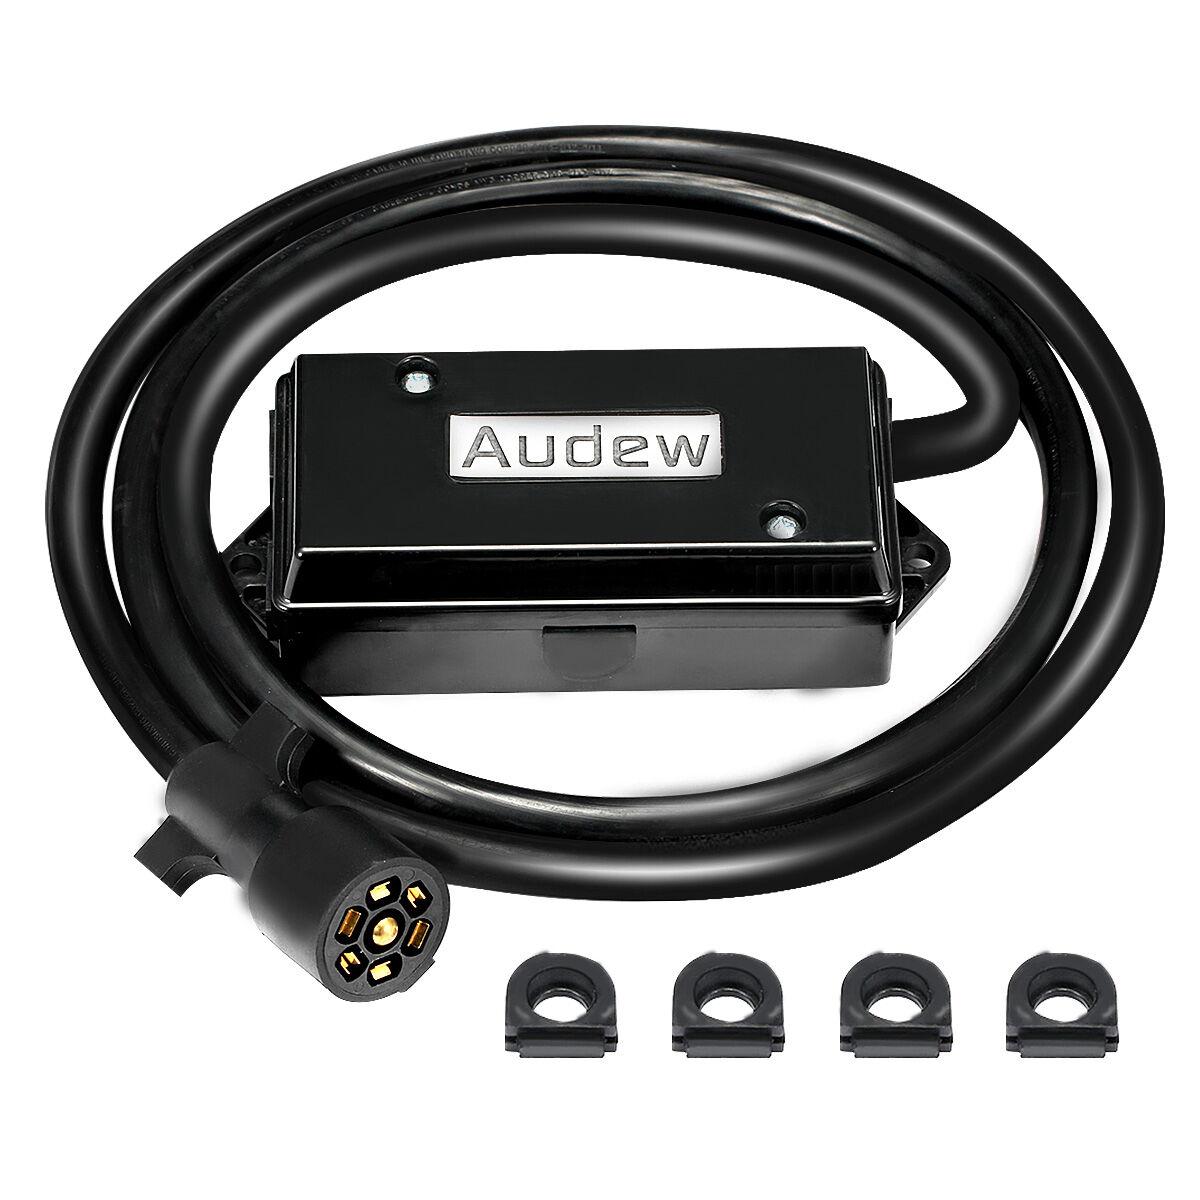 Audew Waterproof 7 Way Trailer Cord with 7 Gang Junction Box & Open/Close Grommets